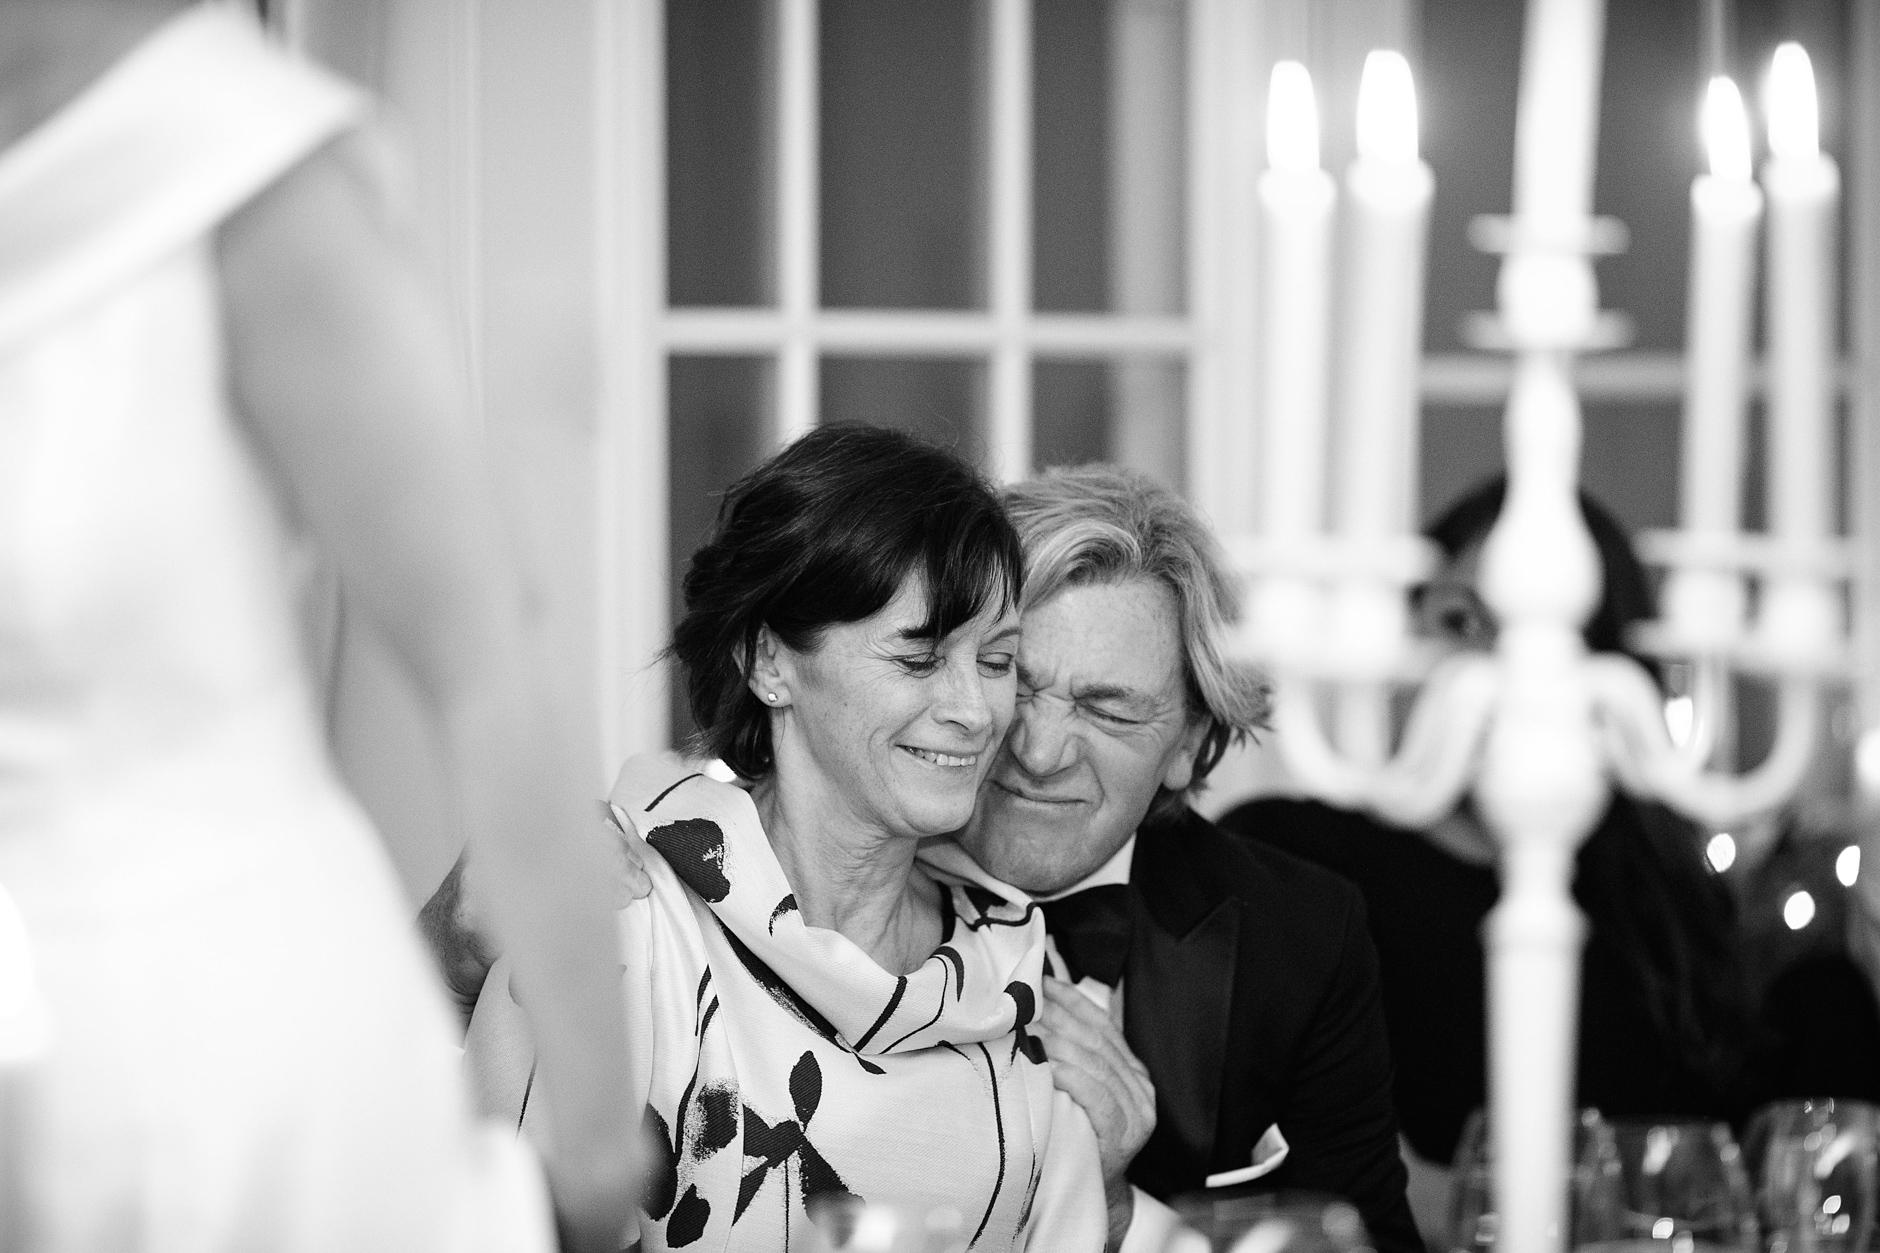 Glentruim-Wedding-Nikki-Leadbetter-Photography-337.jpg